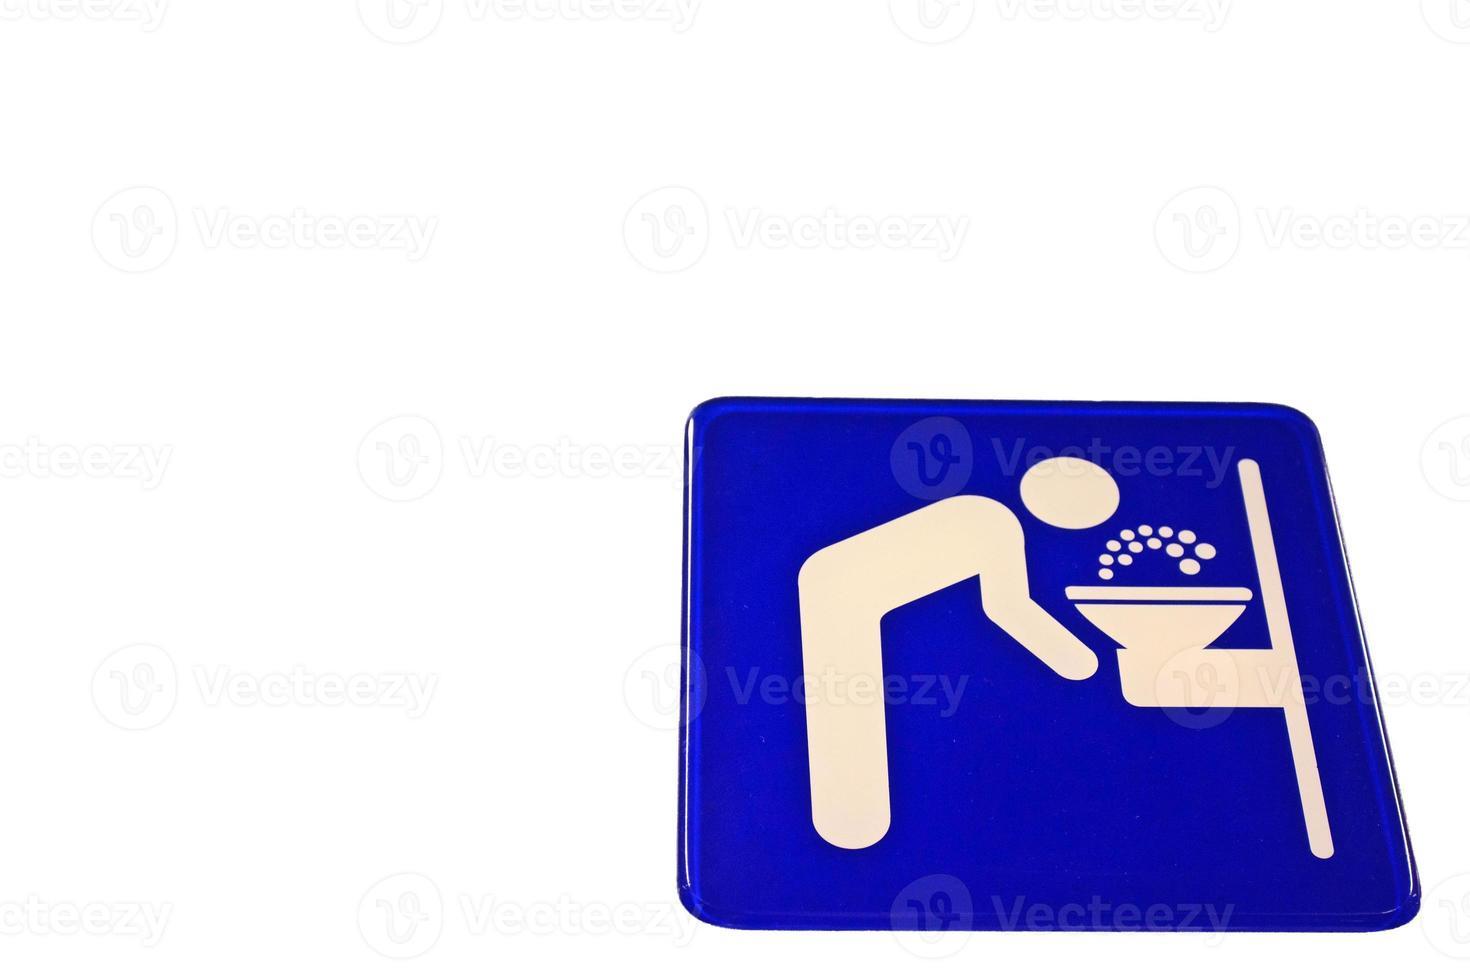 signo de agua potable foto